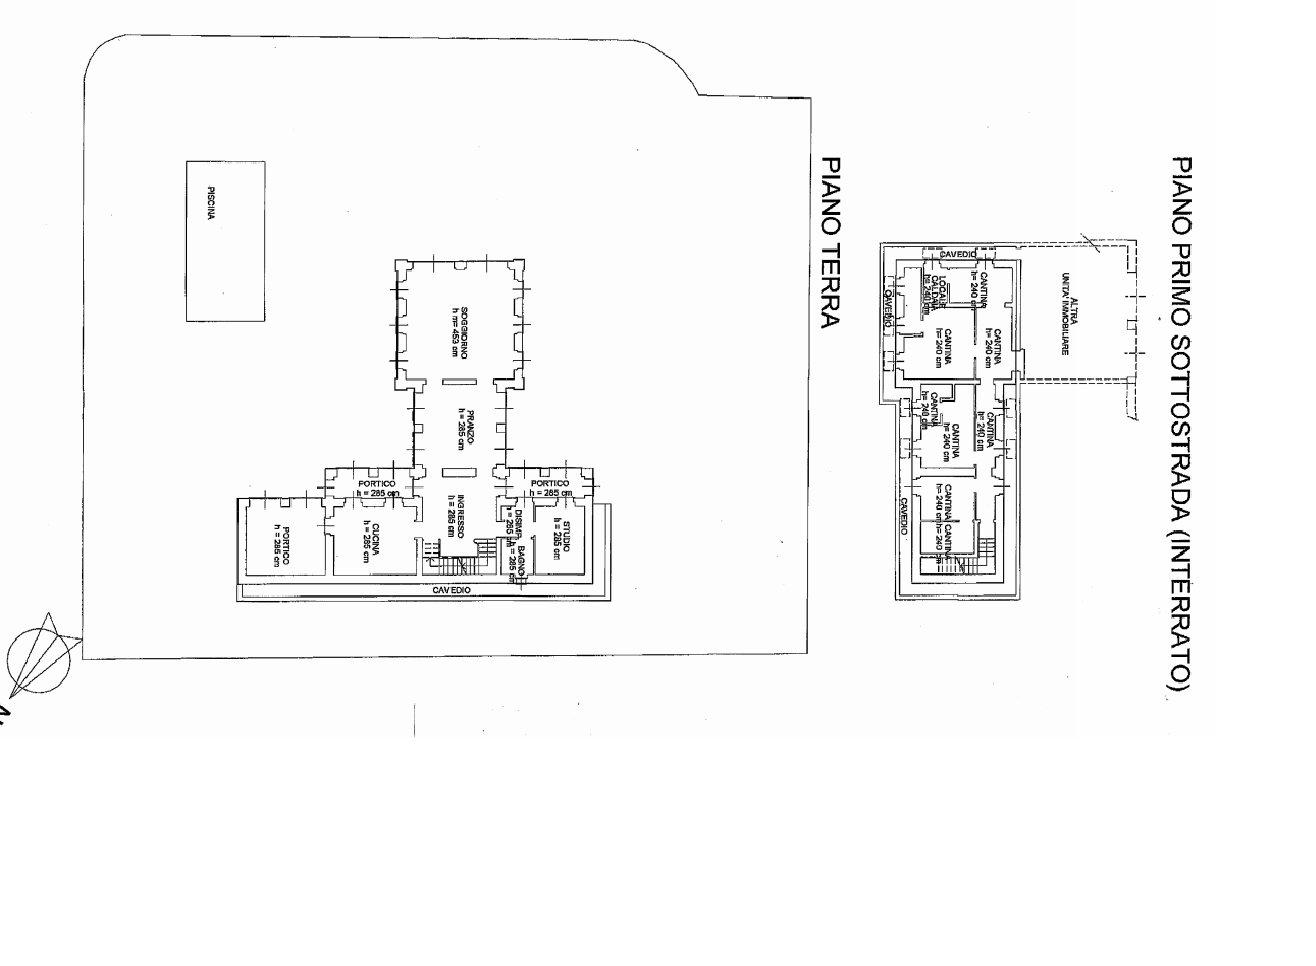 Exclusive villa for sale in Verbania on Lake Maggiore - floor plan A